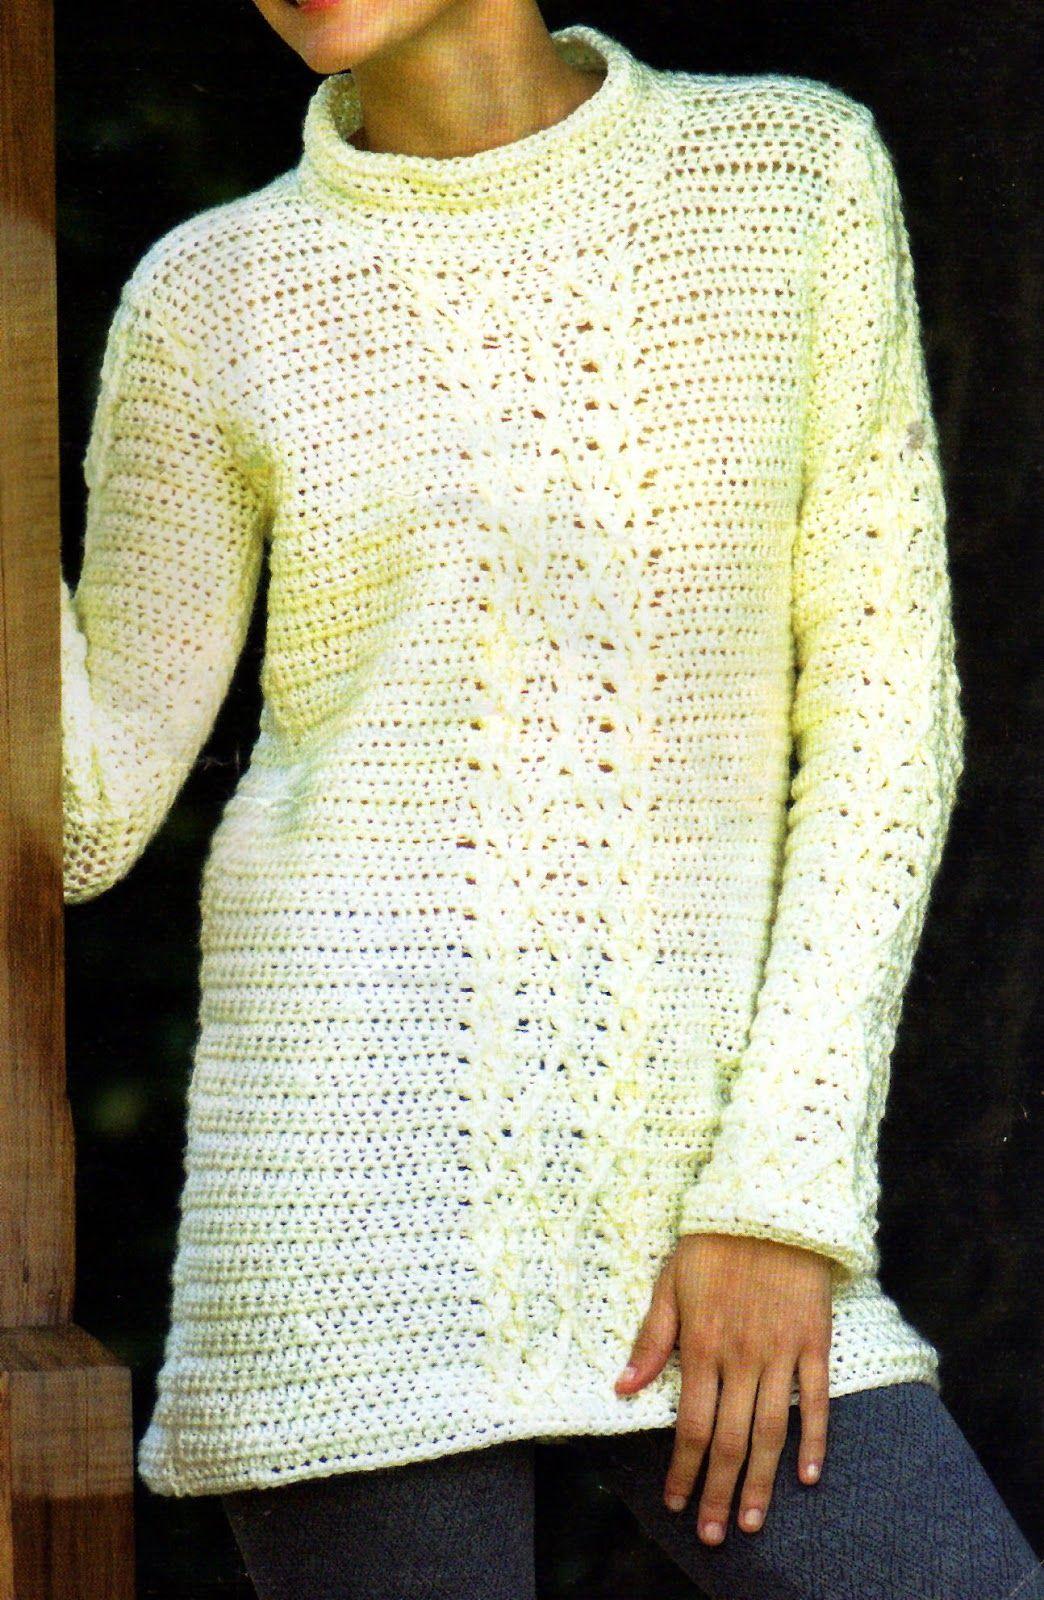 tejidos artesanales en crochet: sueter pull basico tejido en crochet ...